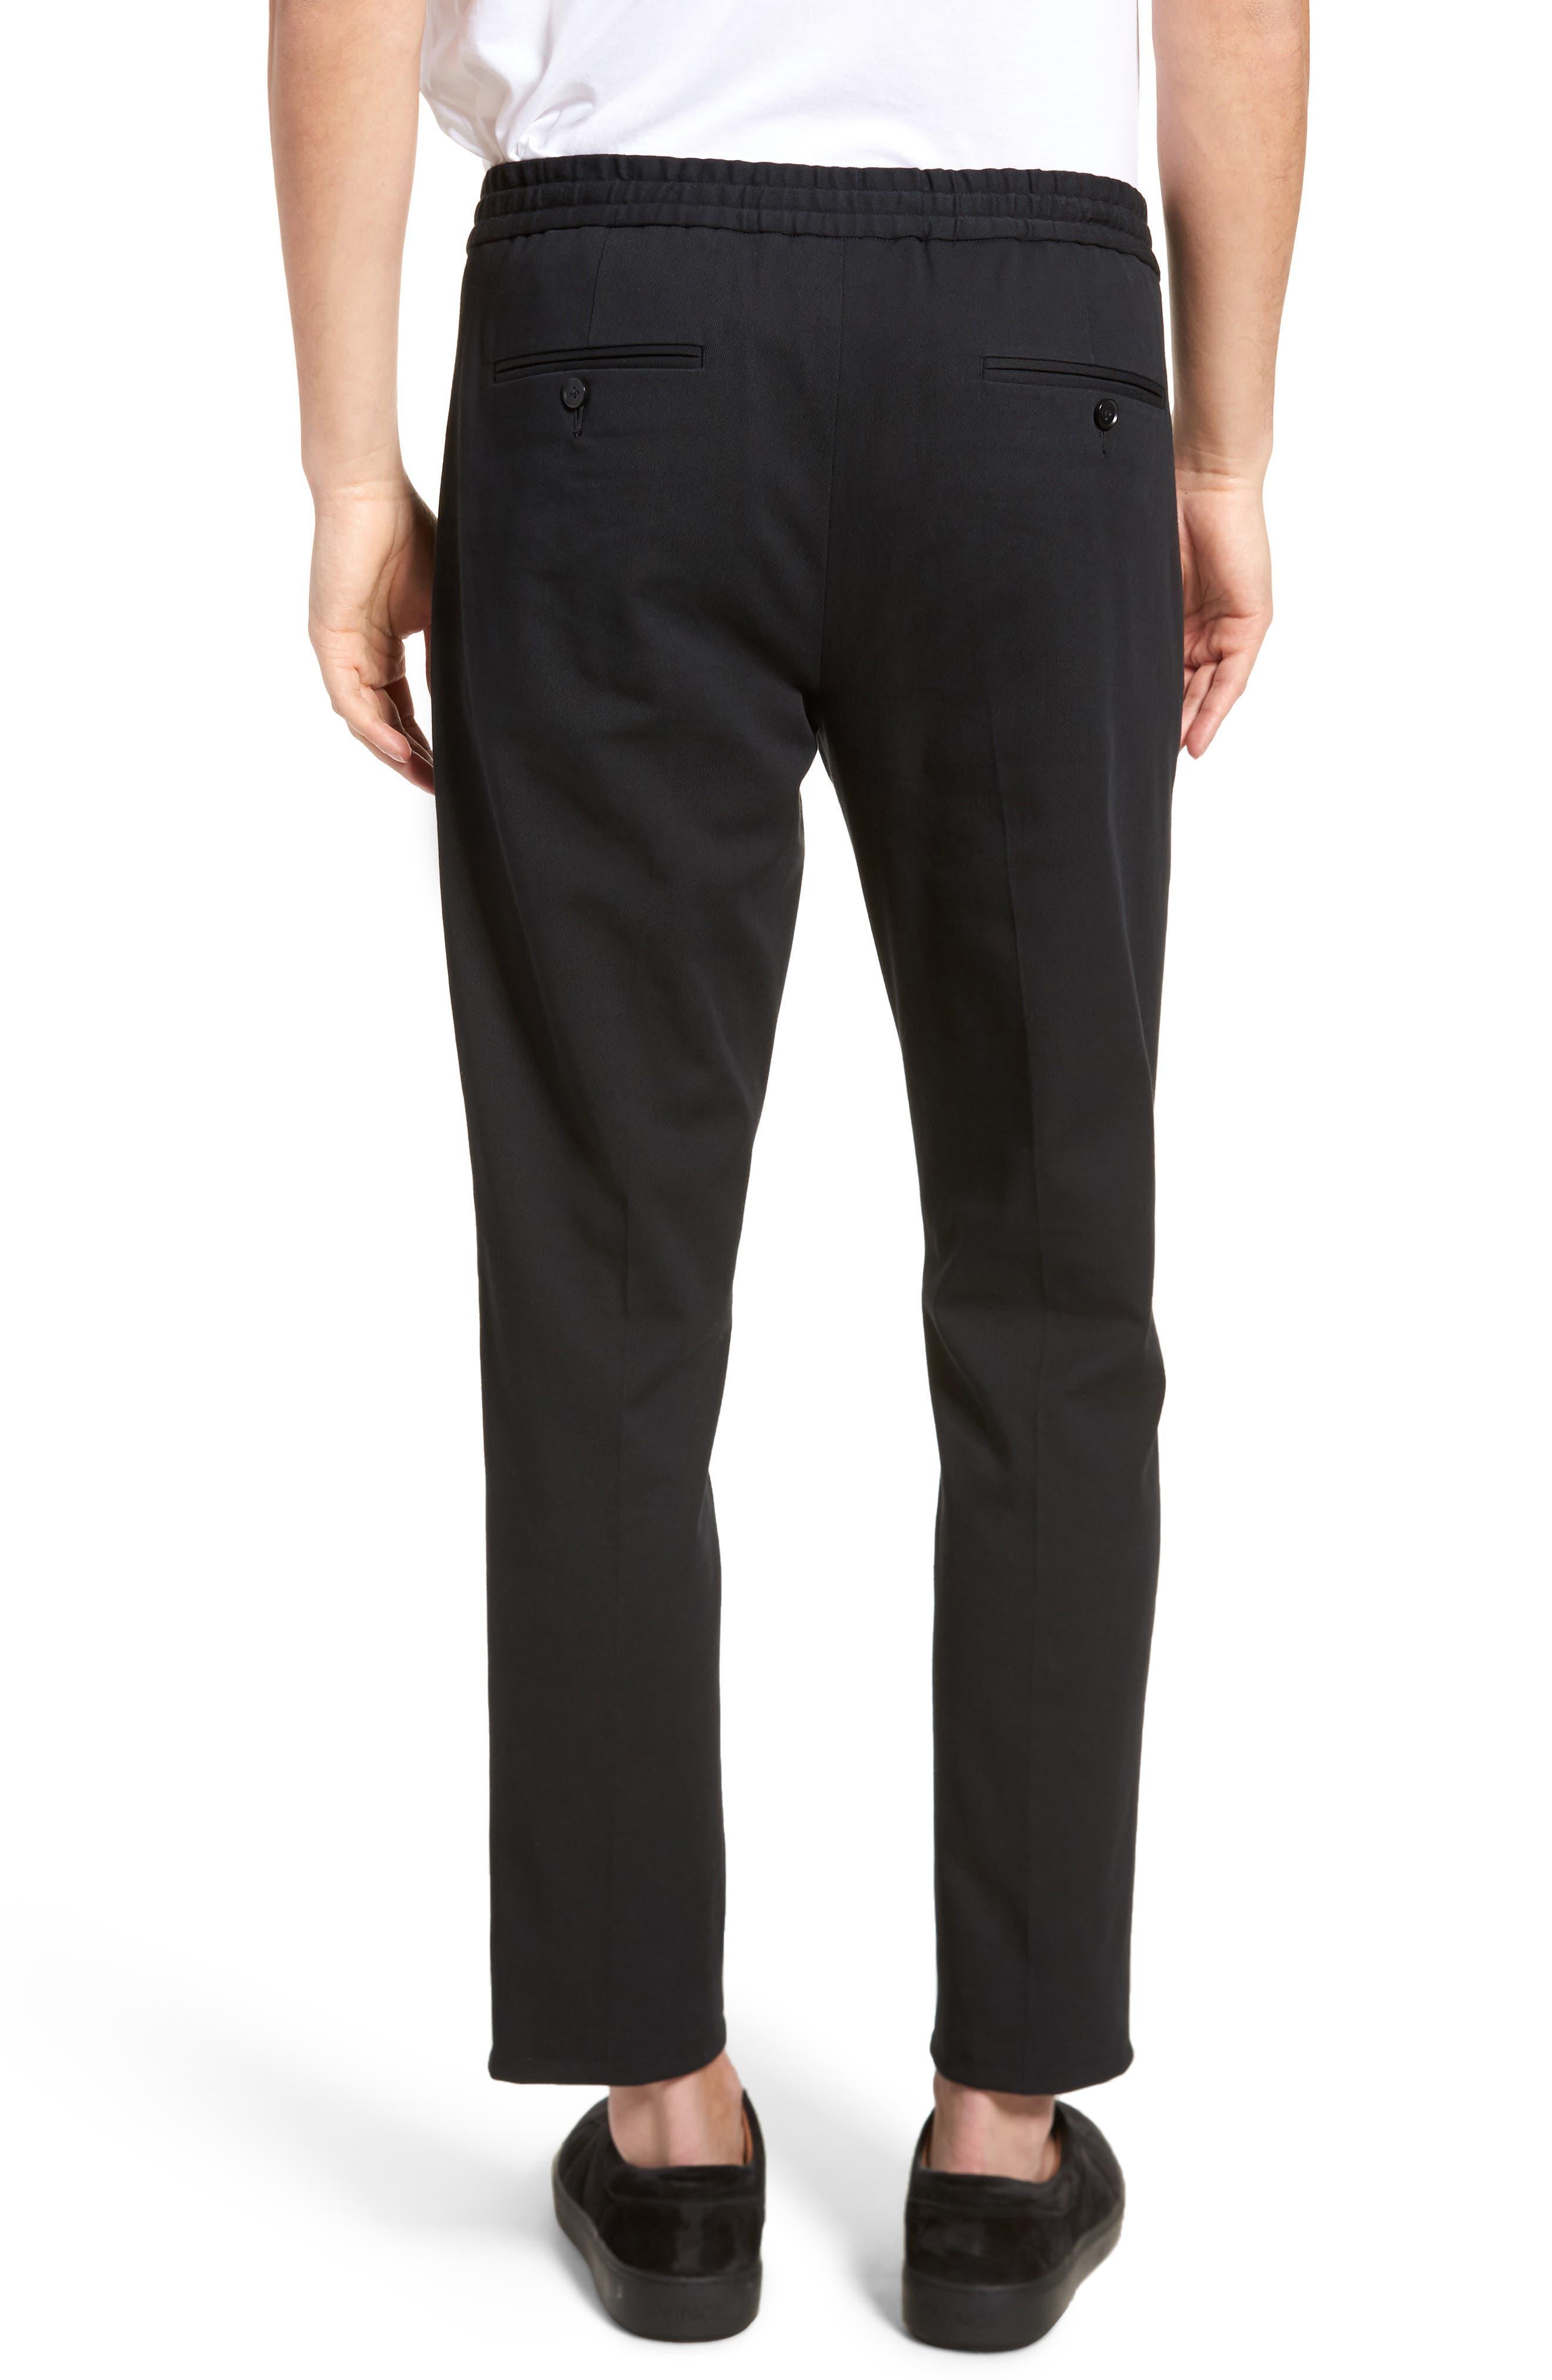 Regular Fit Track Pants,                             Alternate thumbnail 2, color,                             Black